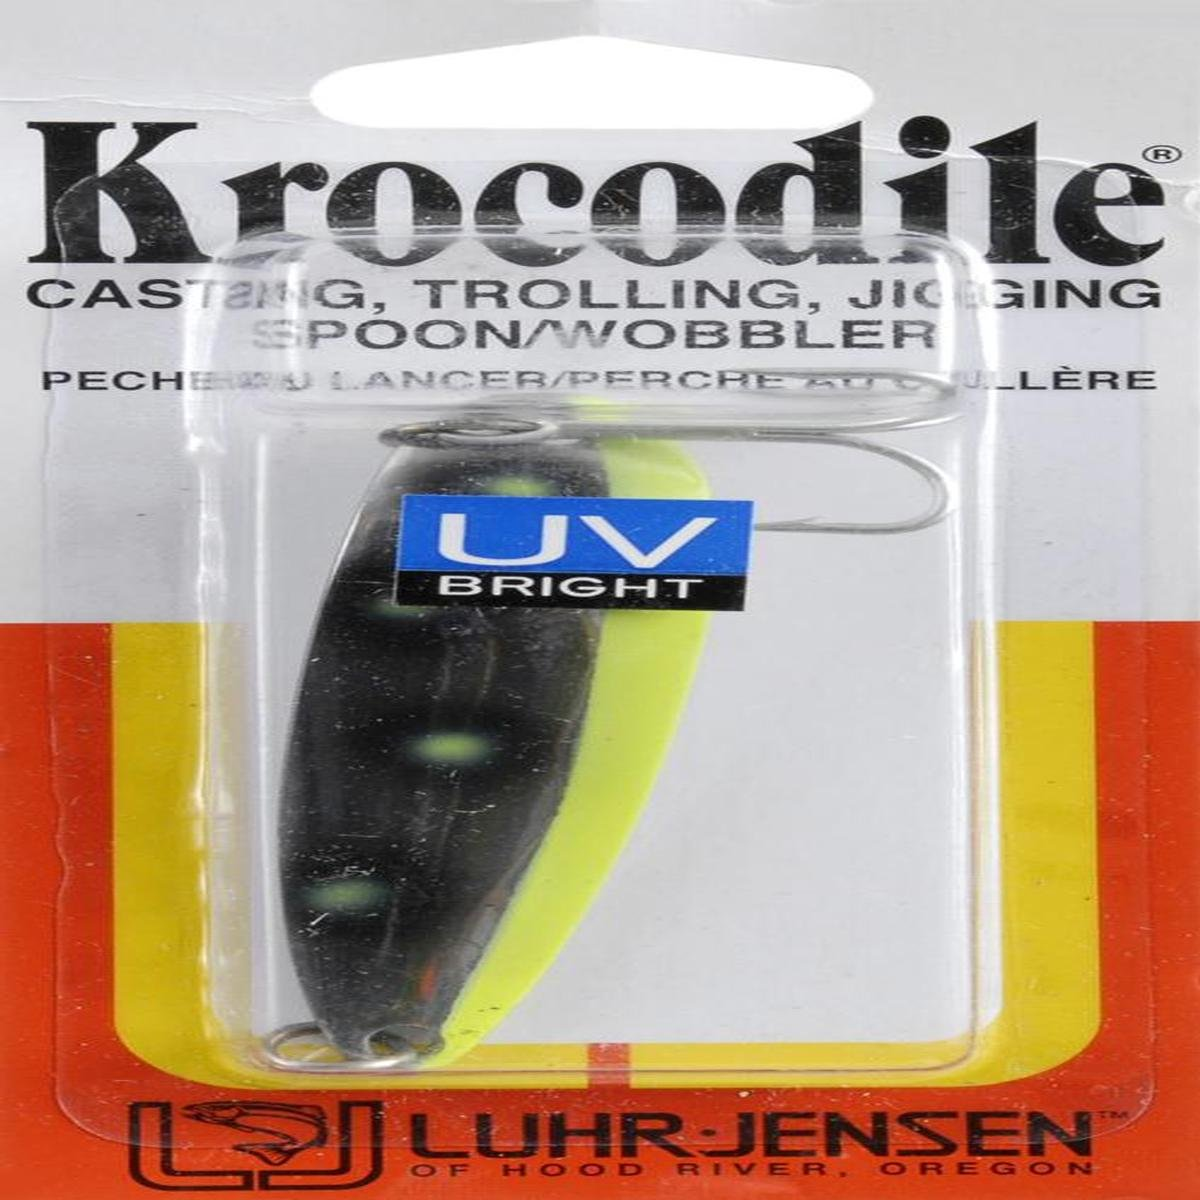 Amazon.com : Luhr Jensen Luhr-Jensen 1 Krocodile (Treble ...